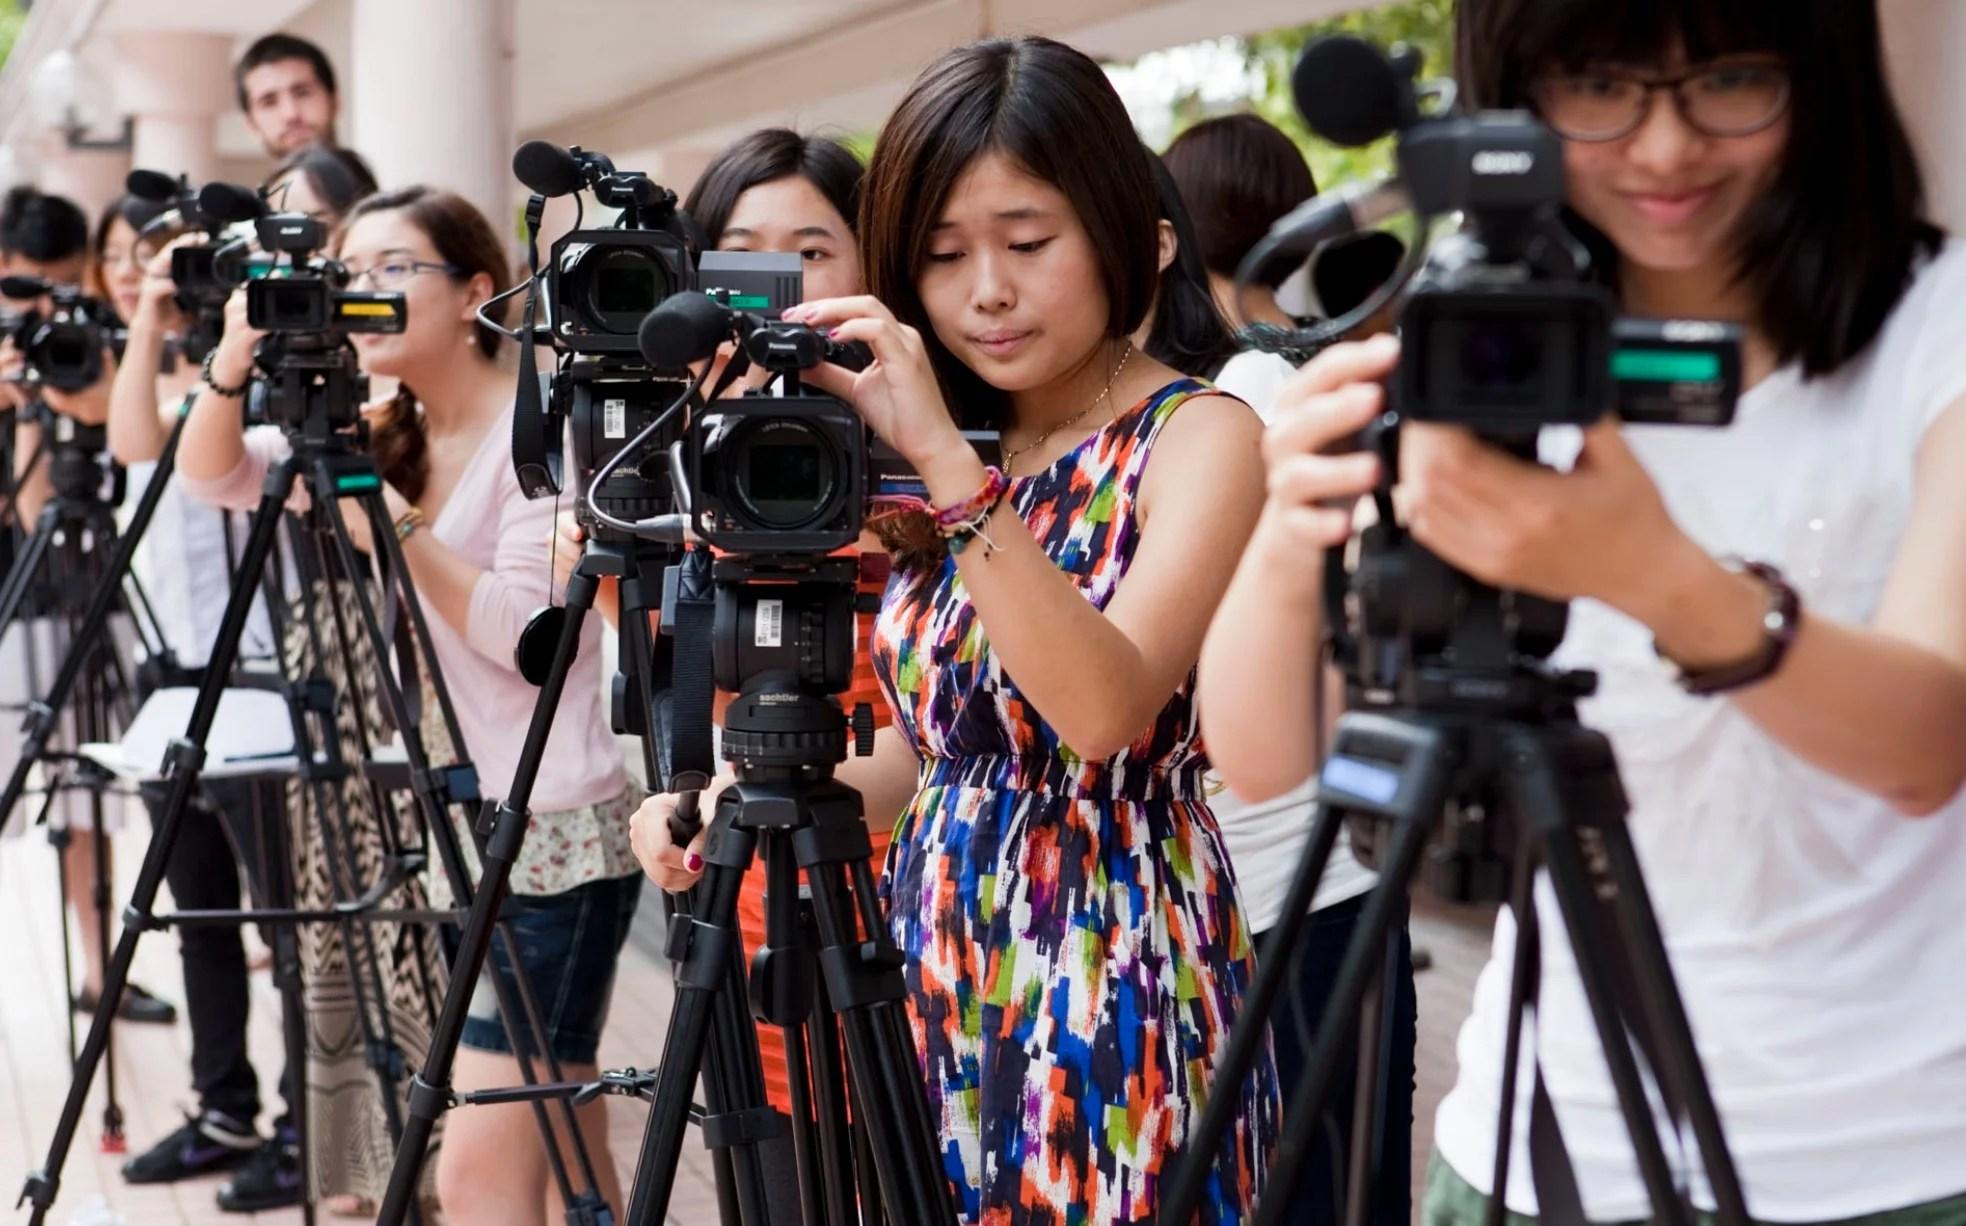 kina journalism marxism